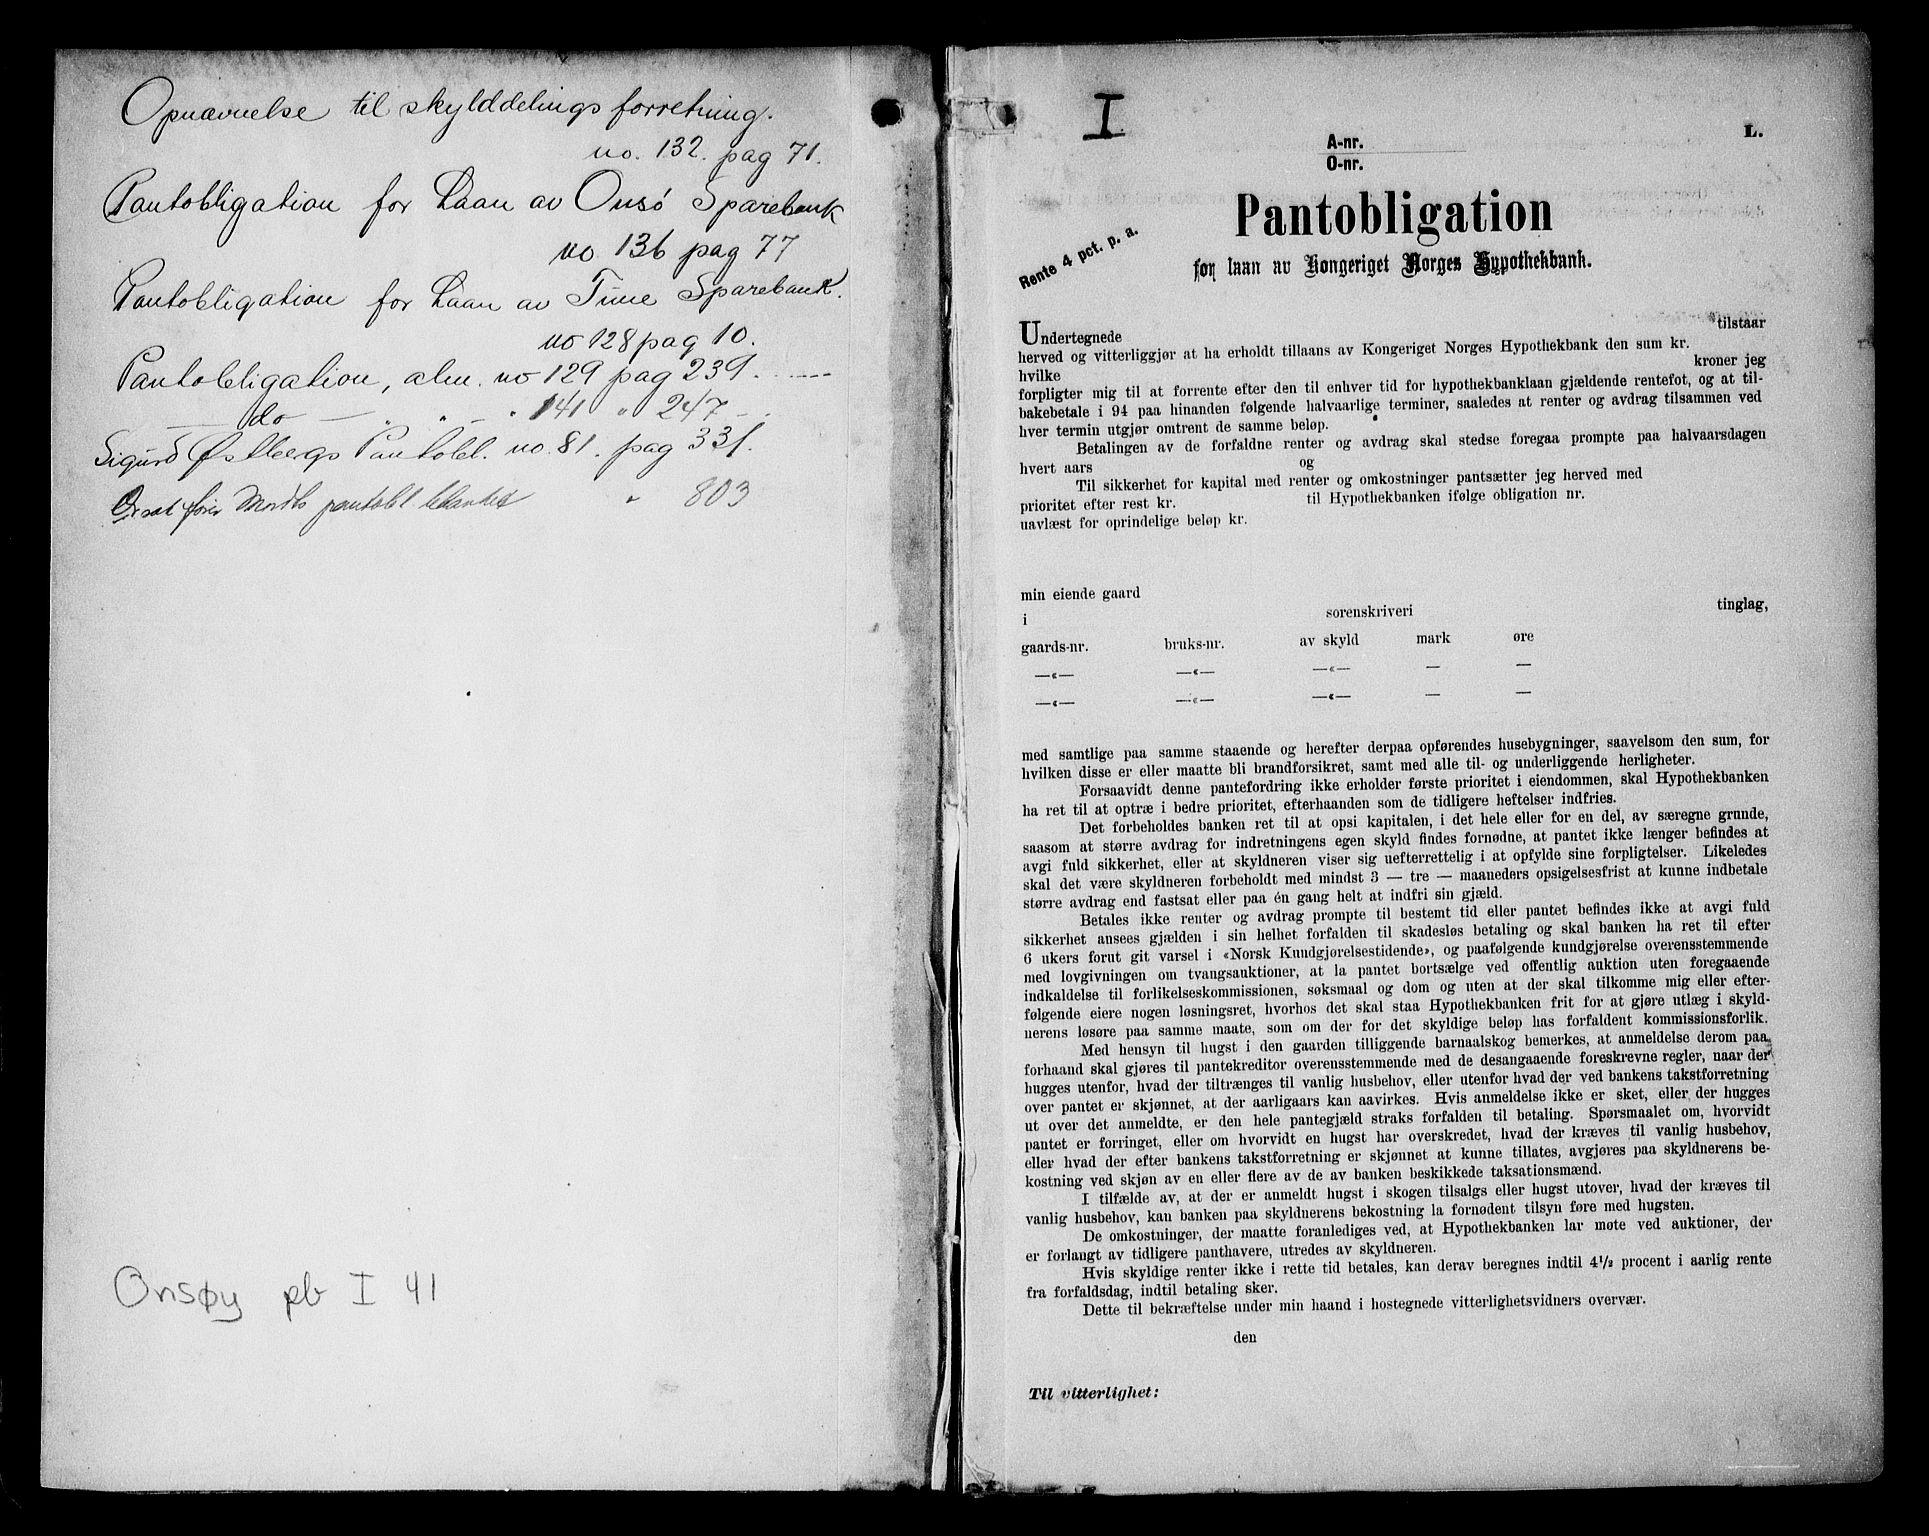 SAO, Onsøy sorenskriveri, G/Ga/Gaa/L0041: Pantebok nr. I 41, 1910-1912, s. 1